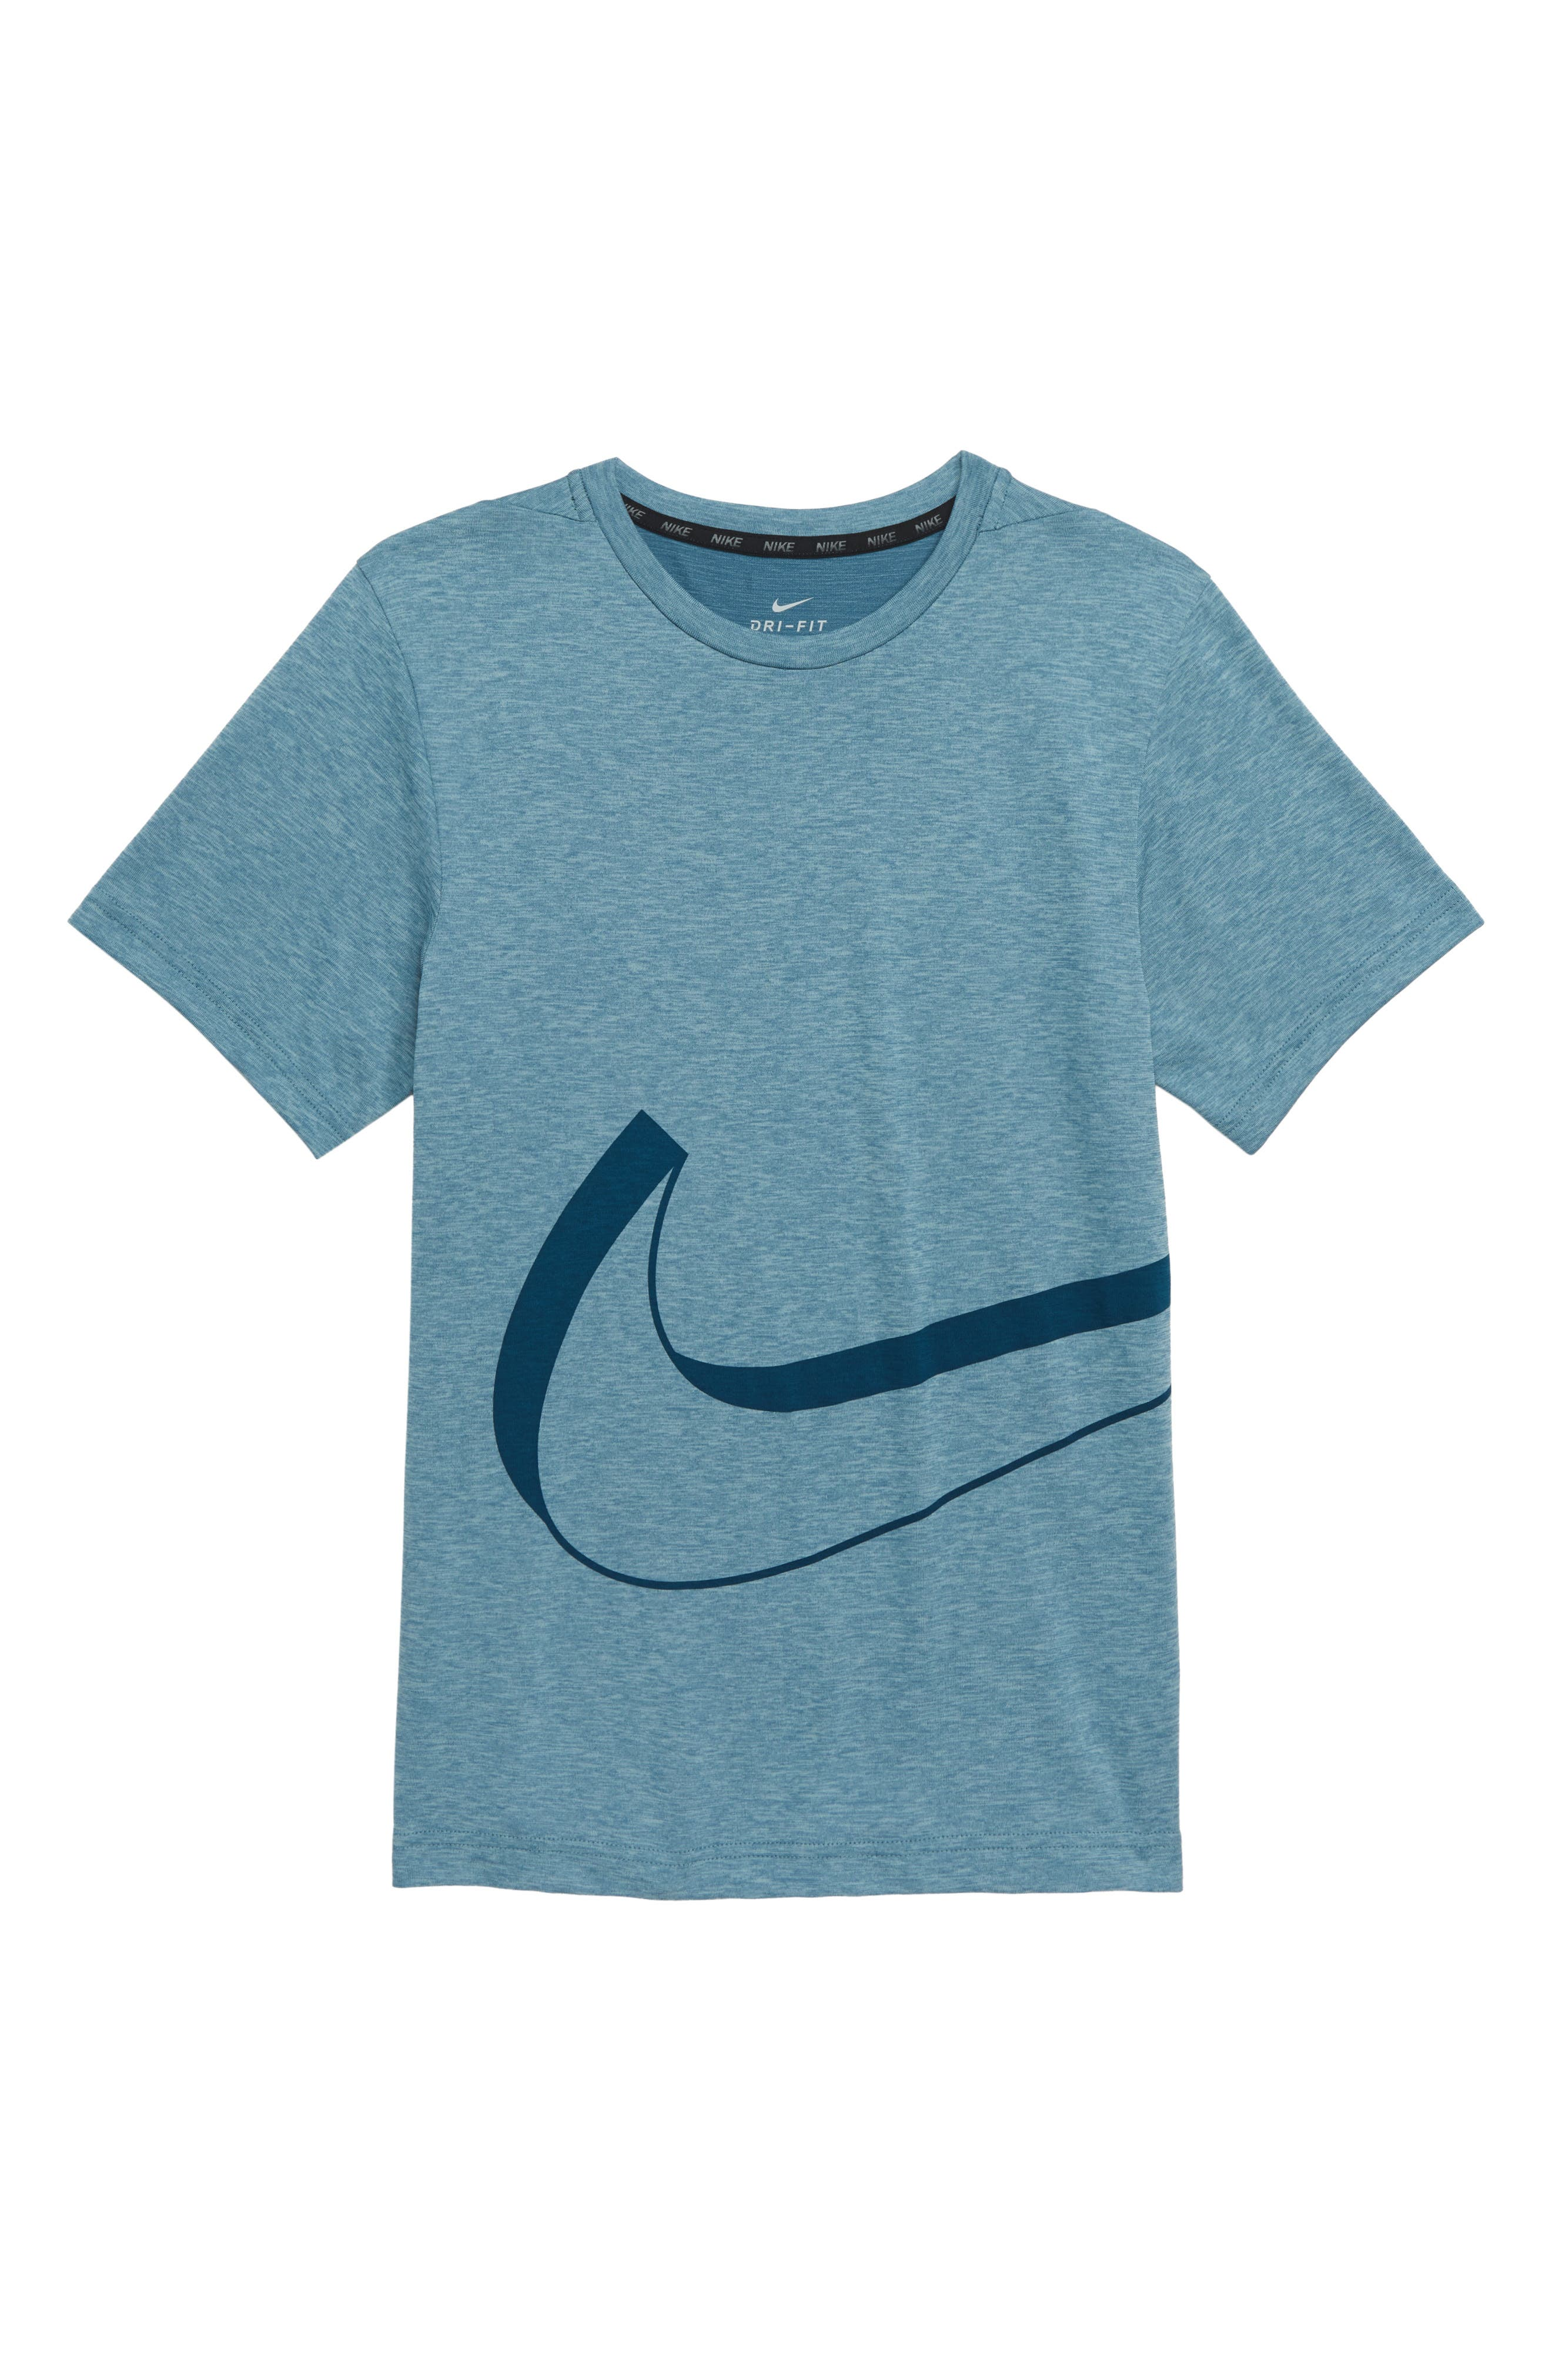 Dry Graphic T-Shirt,                             Main thumbnail 1, color,                             CELESTIAL TEAL/ OCEAN BLISS